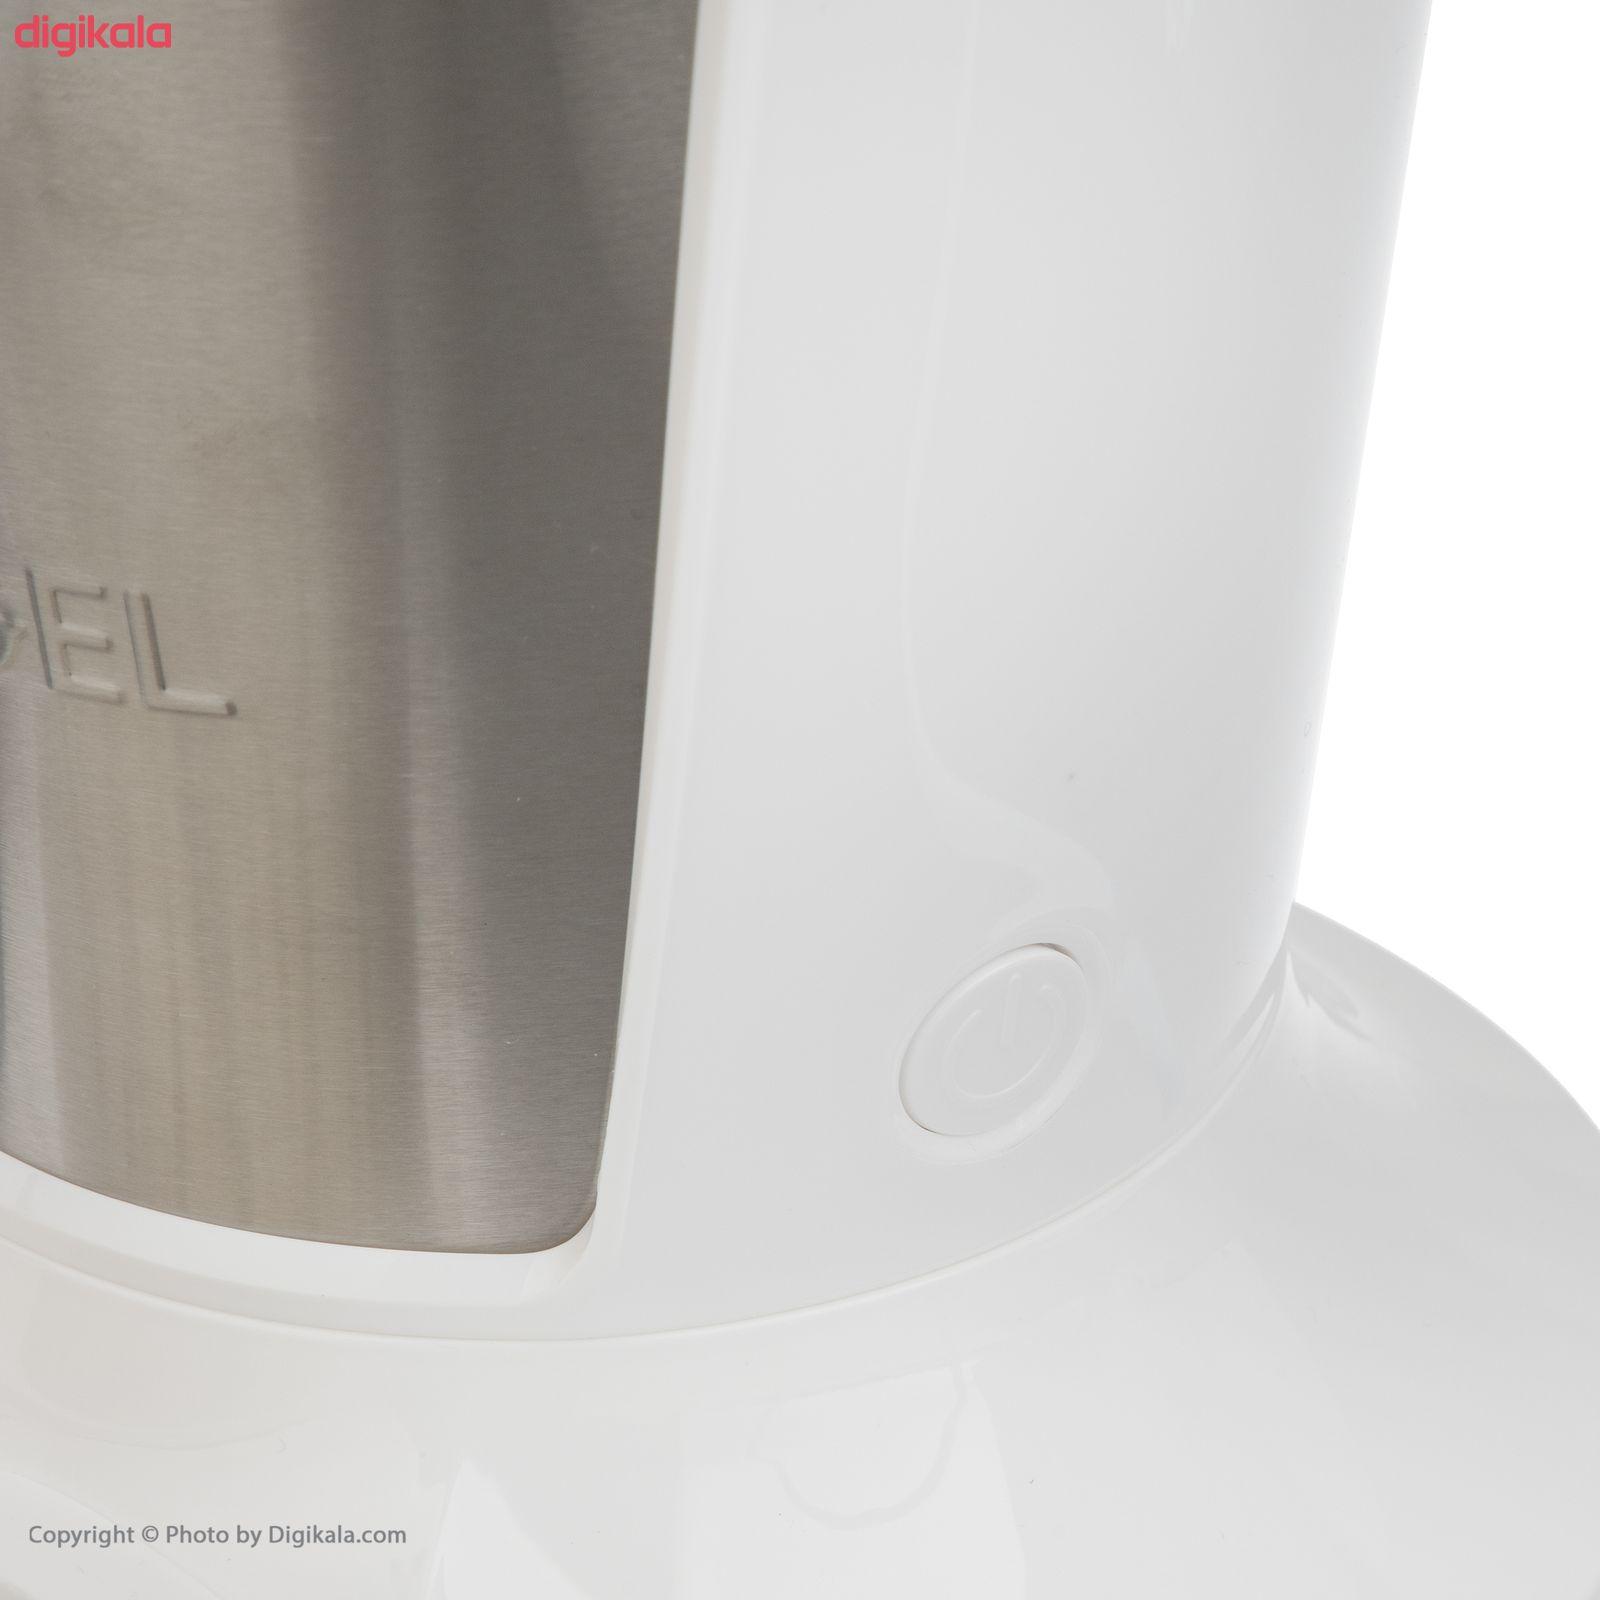 چای ساز میگل مدل GTS 301  main 1 4